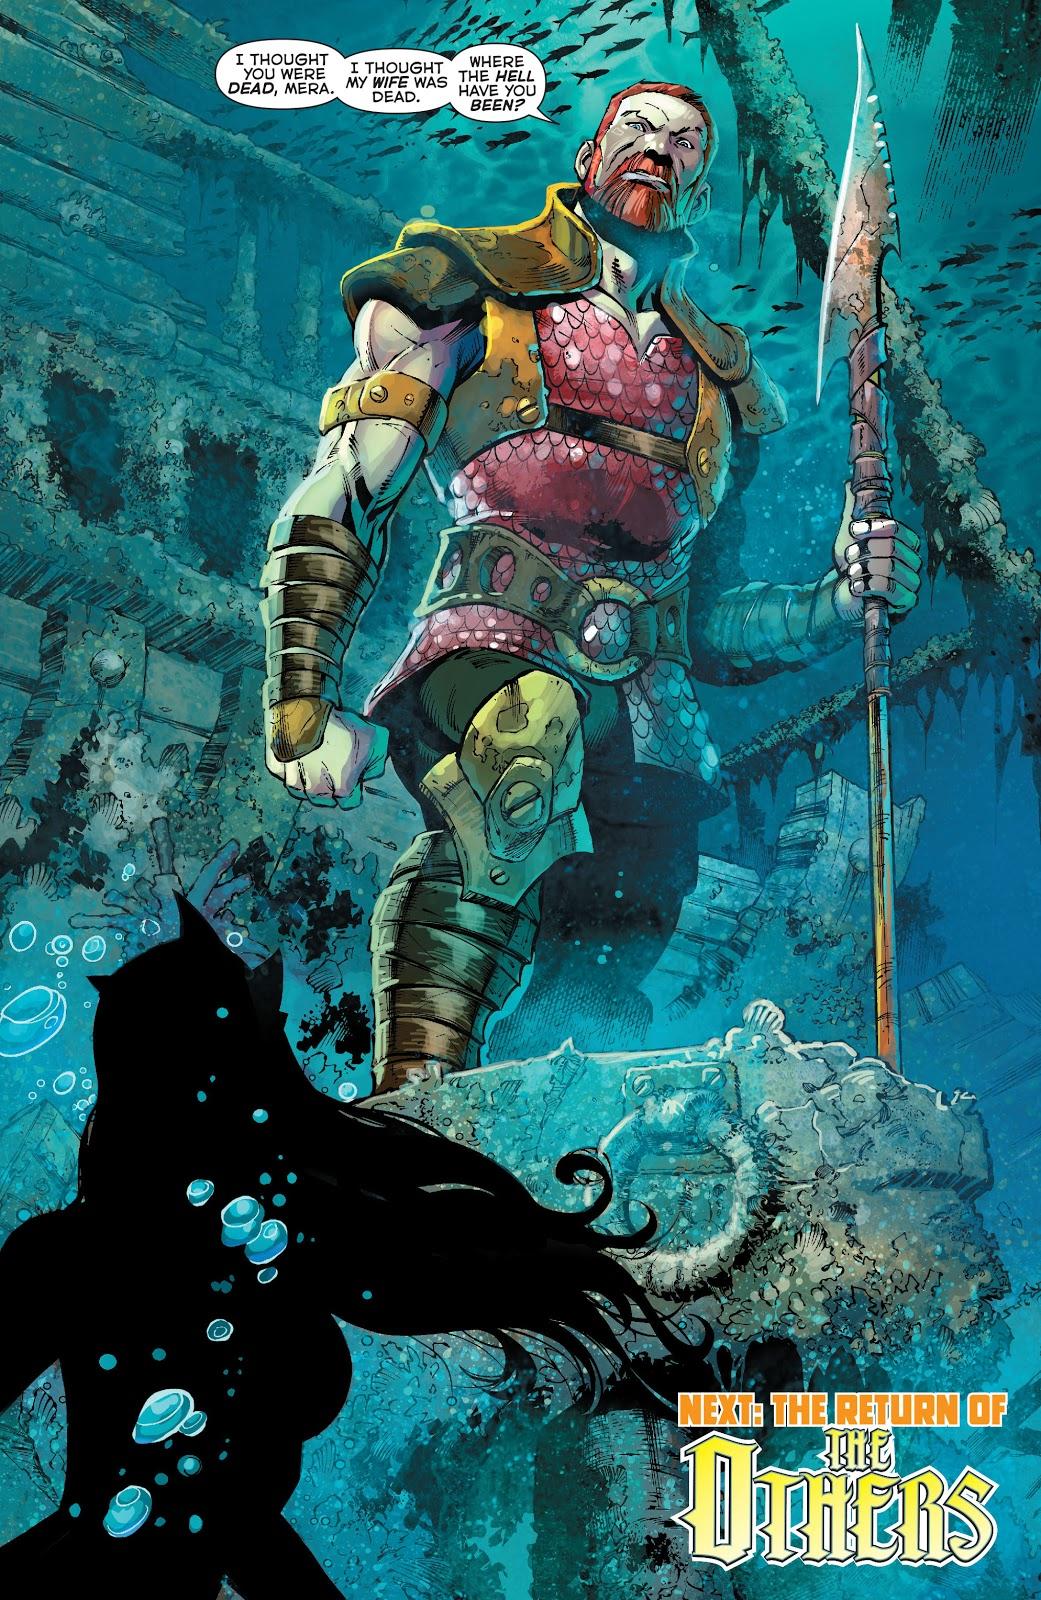 King Nereus